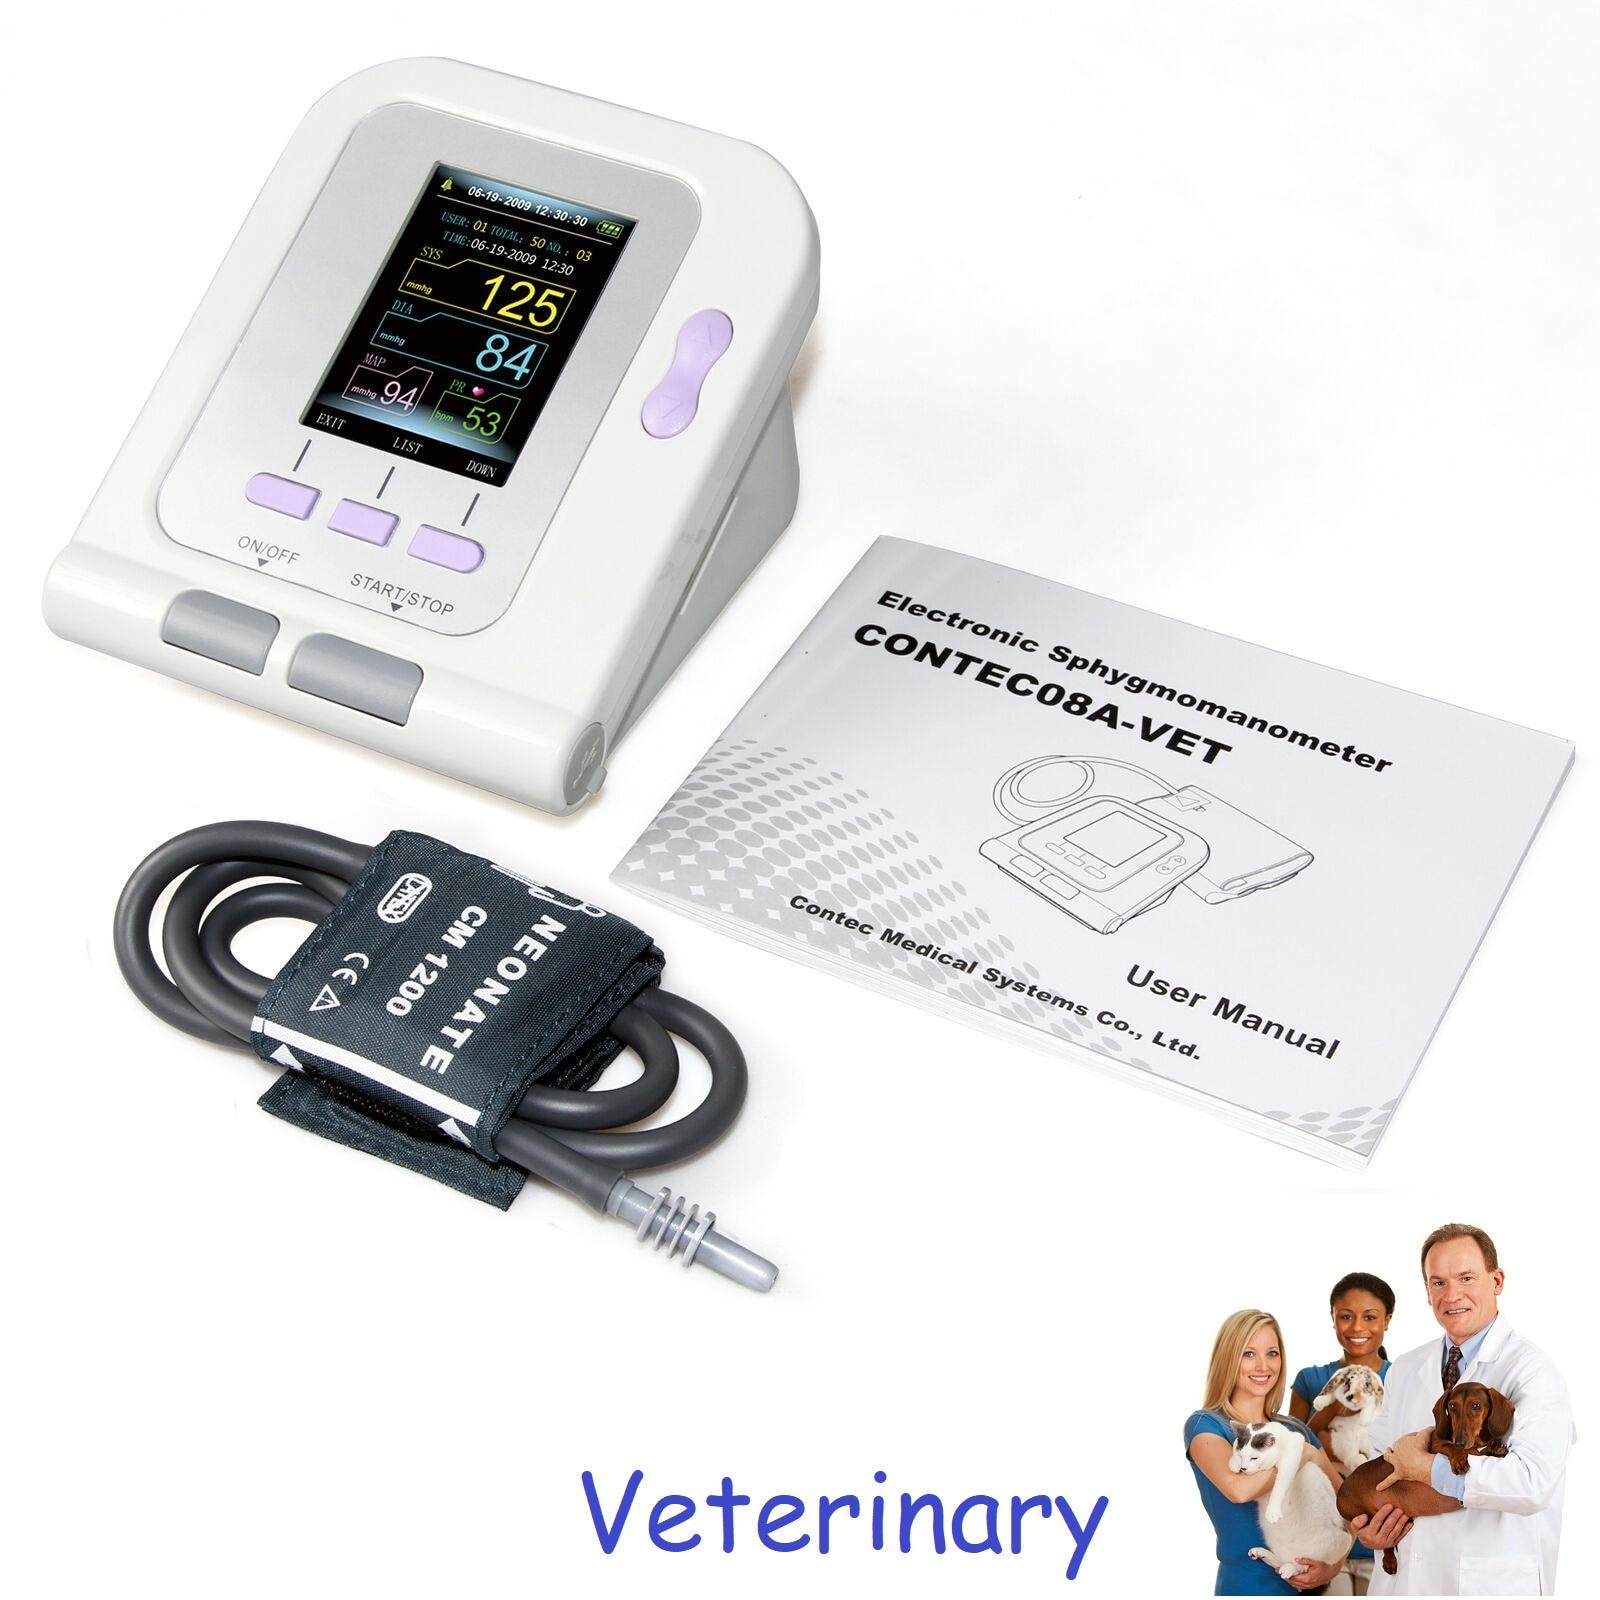 Electronic Sphygmomanometer Digital Blood Pressure Veterinary Vet Use Monitor CONTEC08A Pets Dog Cat